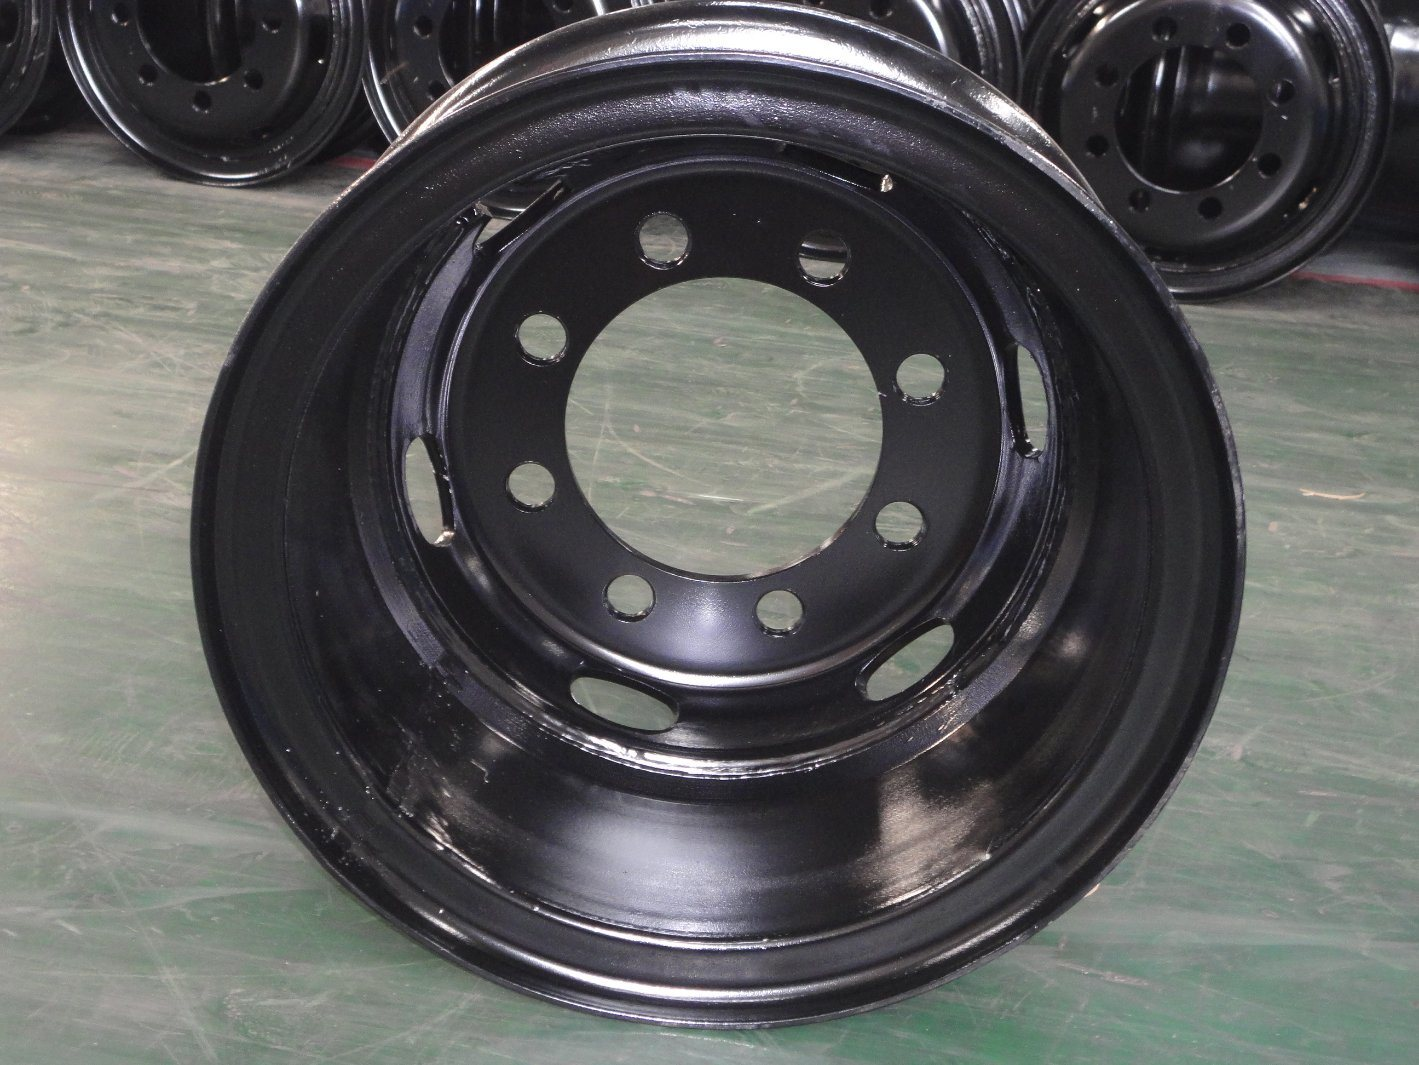 Trailer Steel Wheel Rim/7.5-20/China Made High Quality/Tube/Tubeless Rims